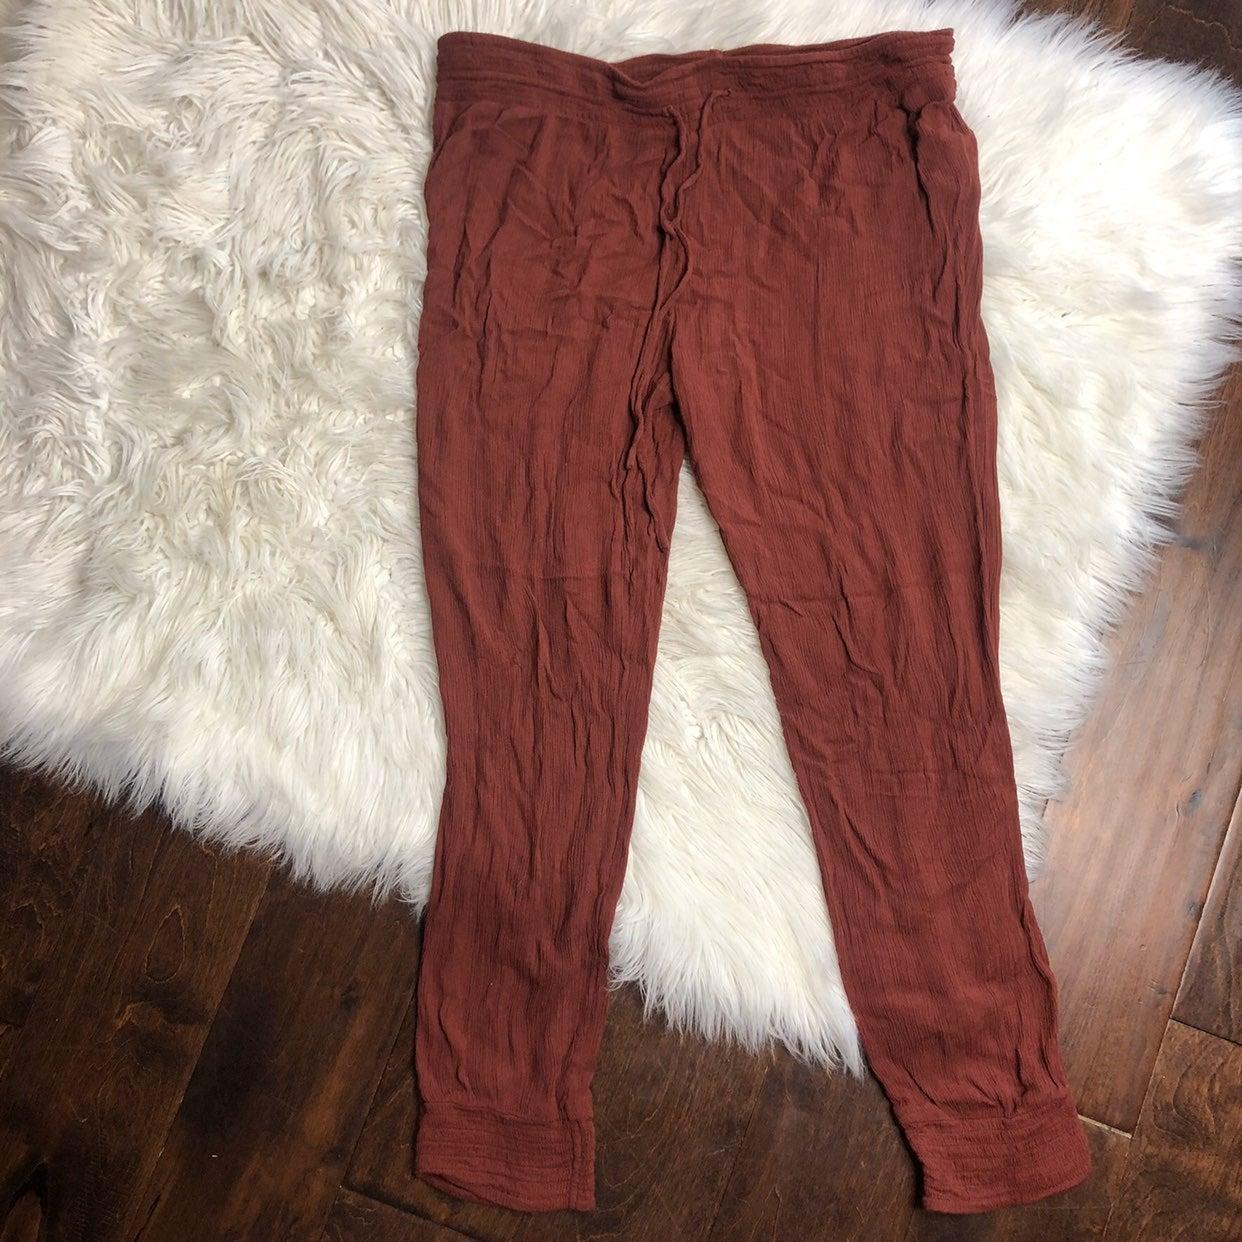 Urban outfitters jogger pants medium